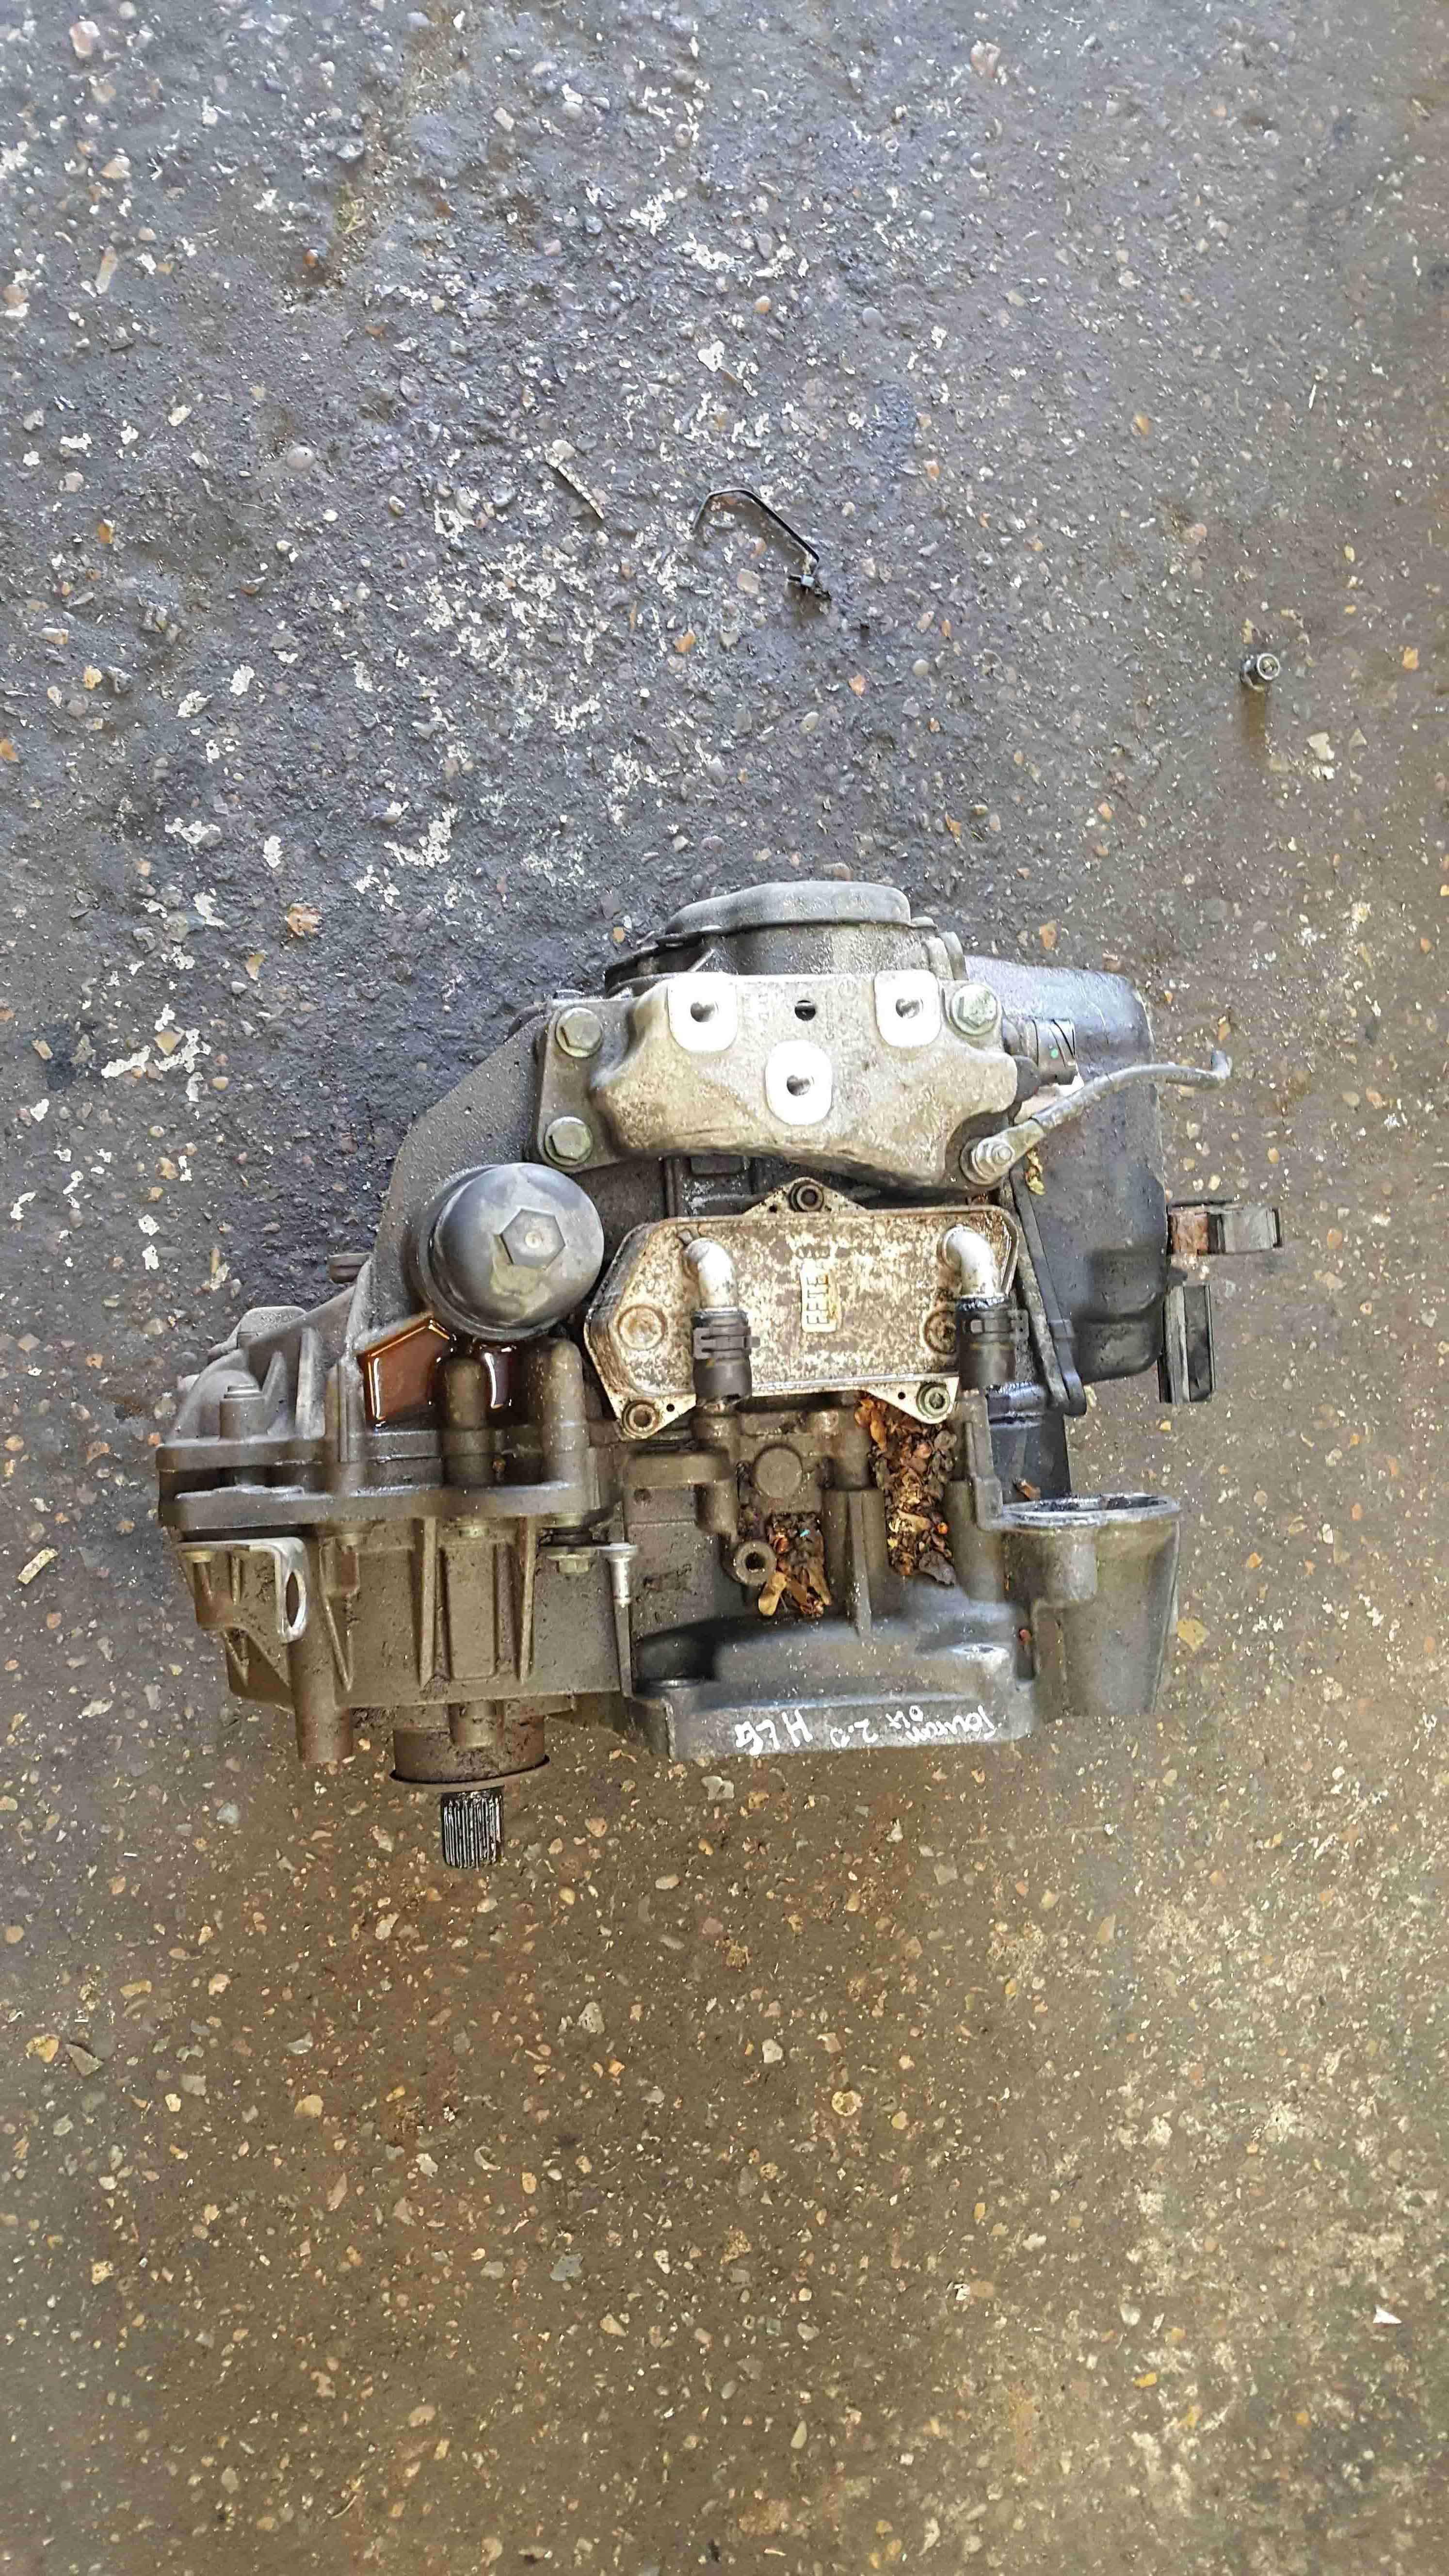 Volkswagen Touran 2003-2010 2.0 TDi Automatic Auto Gearbox HLG